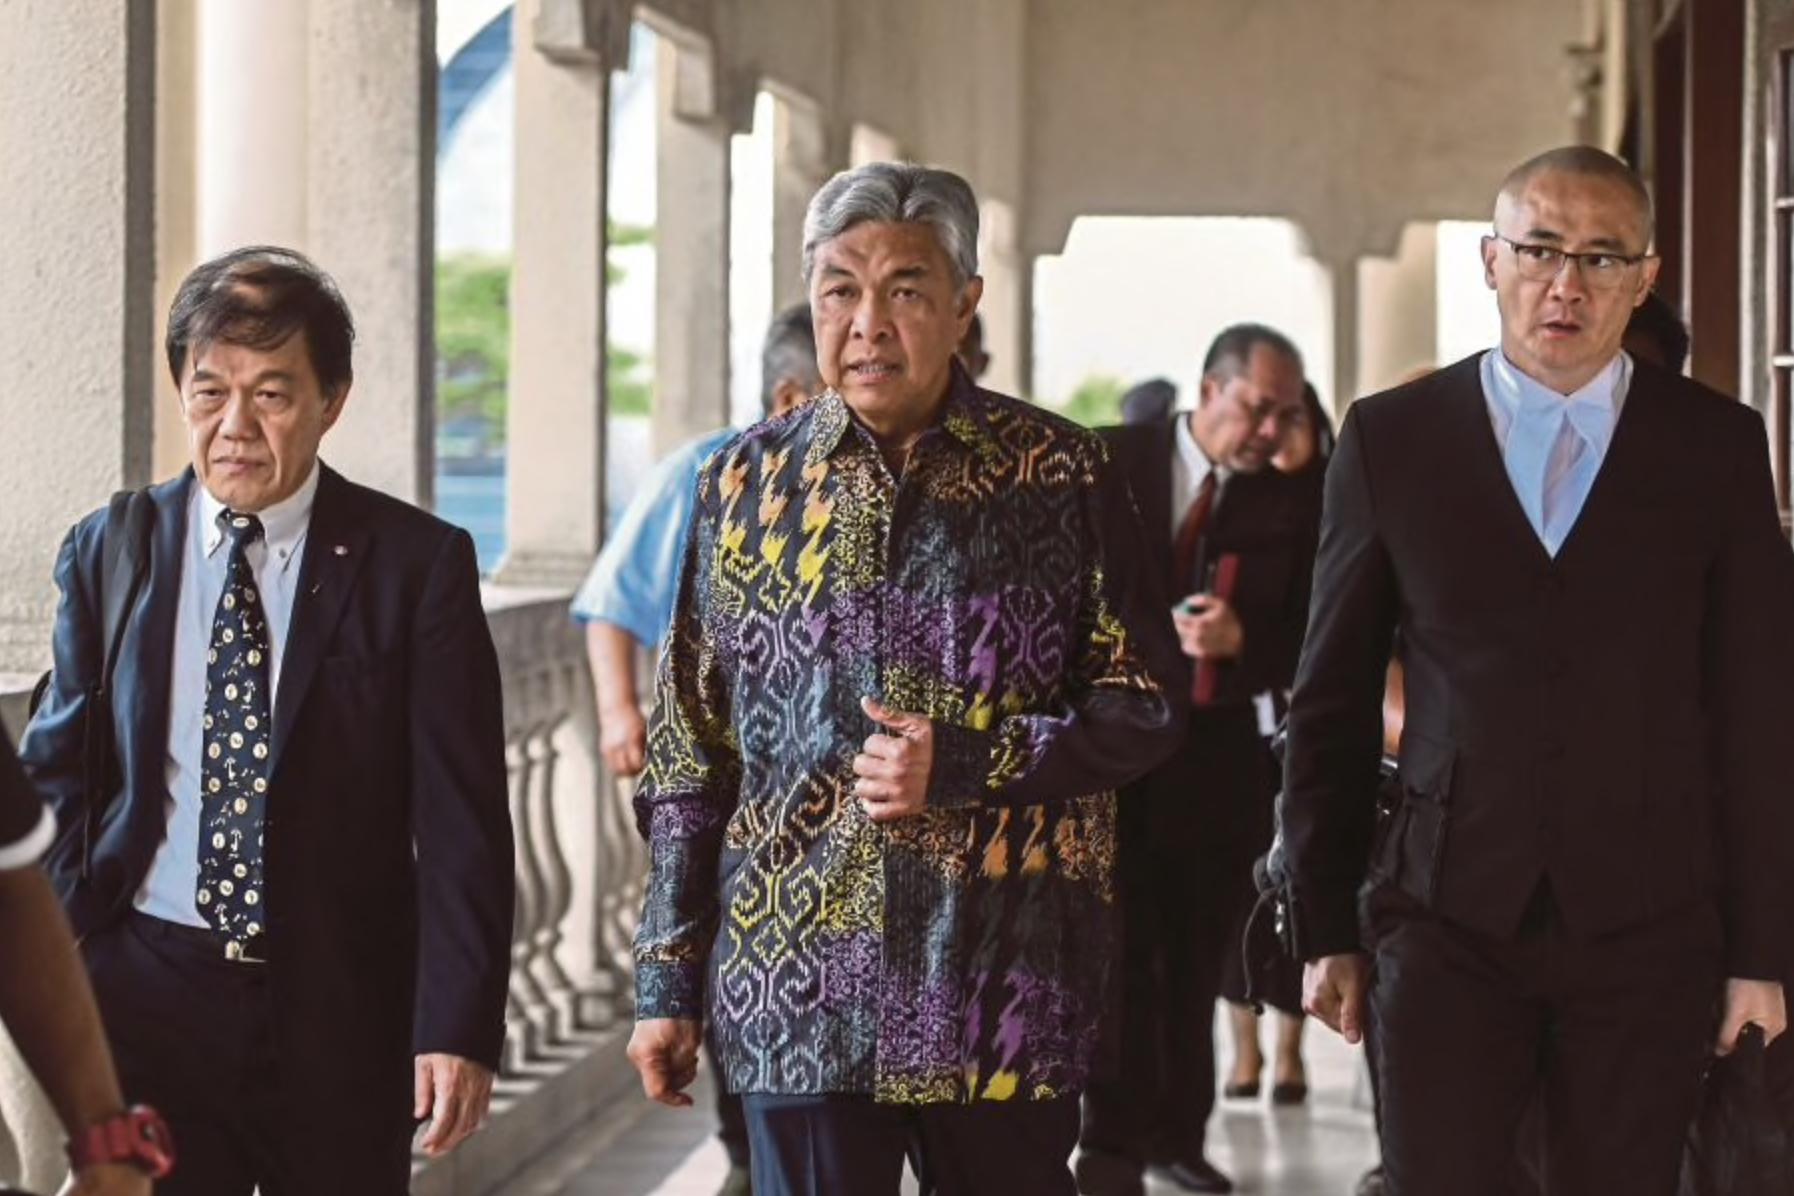 Umno president Datuk Seri Dr Ahmad Zahid Hamidi was today slapped with an additional criminal breach of trust (CBT) charge involving RM260,000 belonging to Yayasan Akalbudi. (Bernama photo)